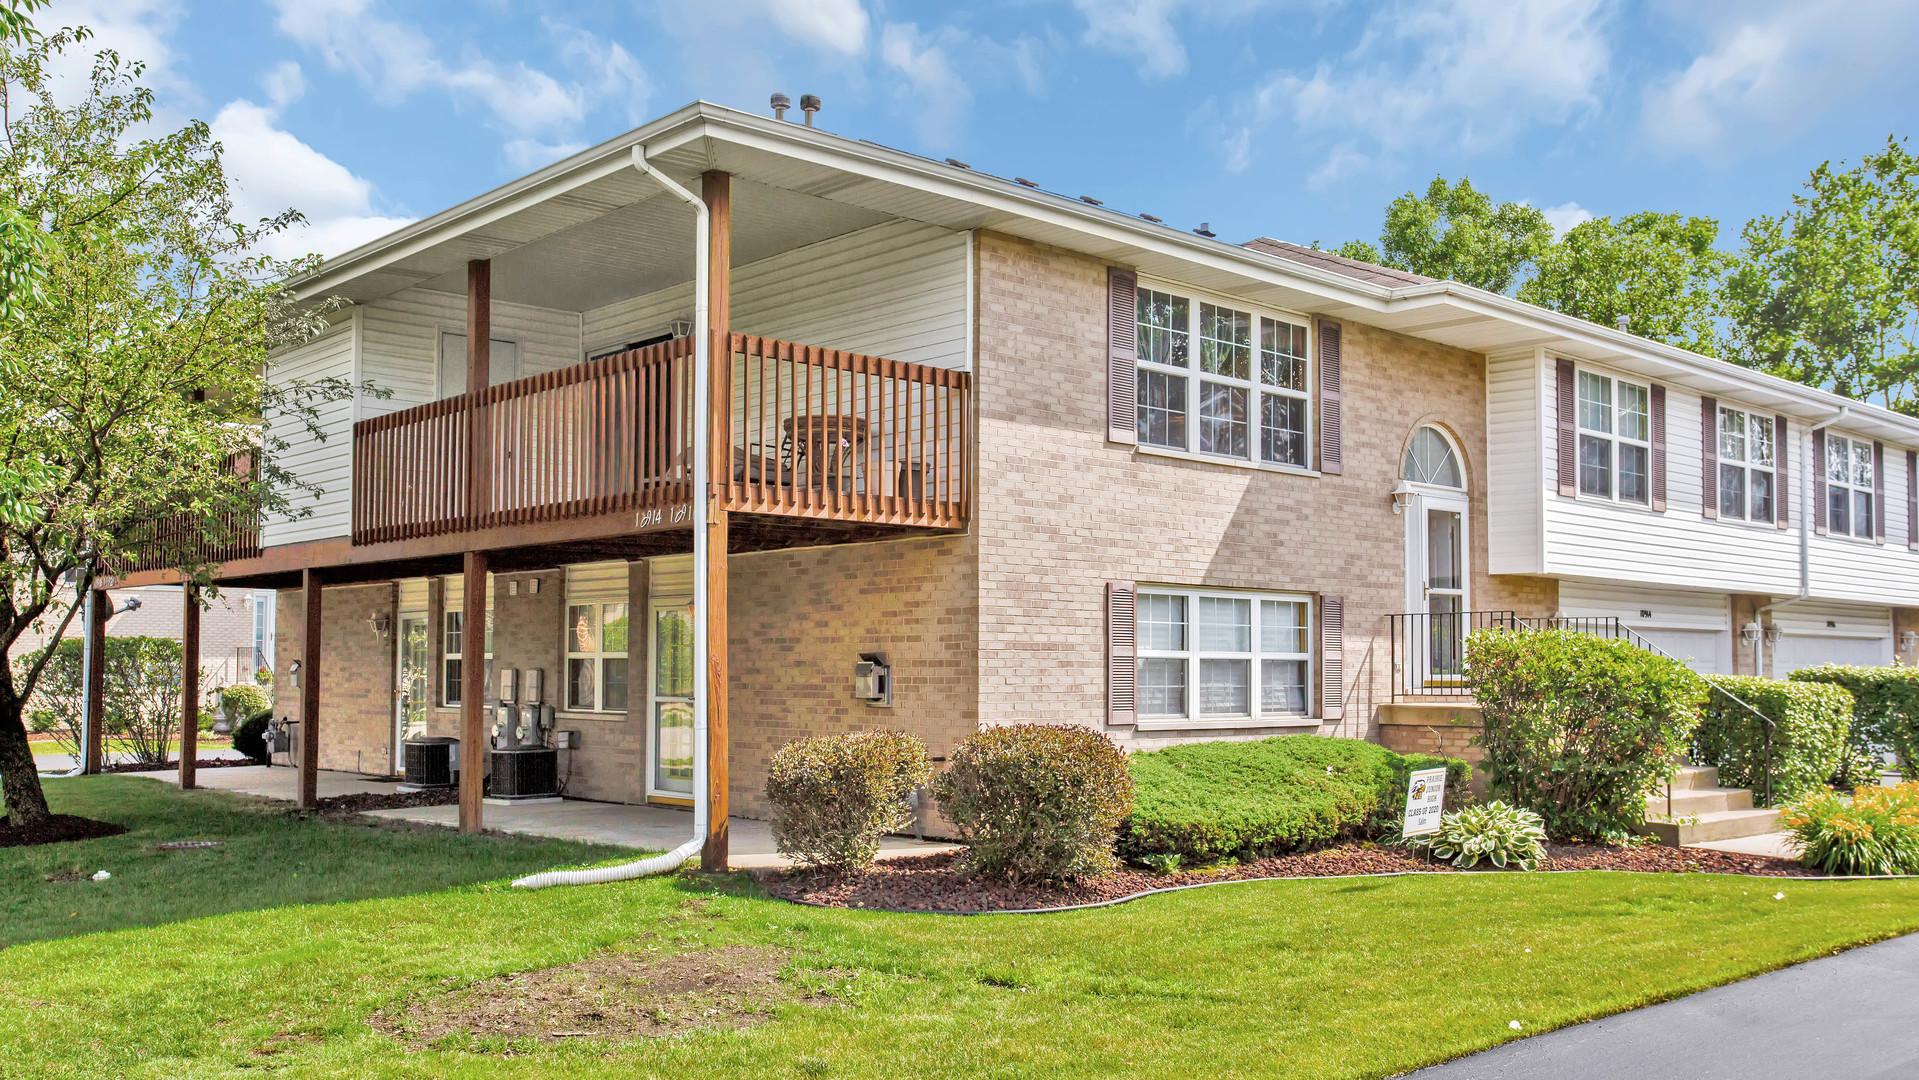 10914 Lorel, Oak Lawn, Illinois, 60453